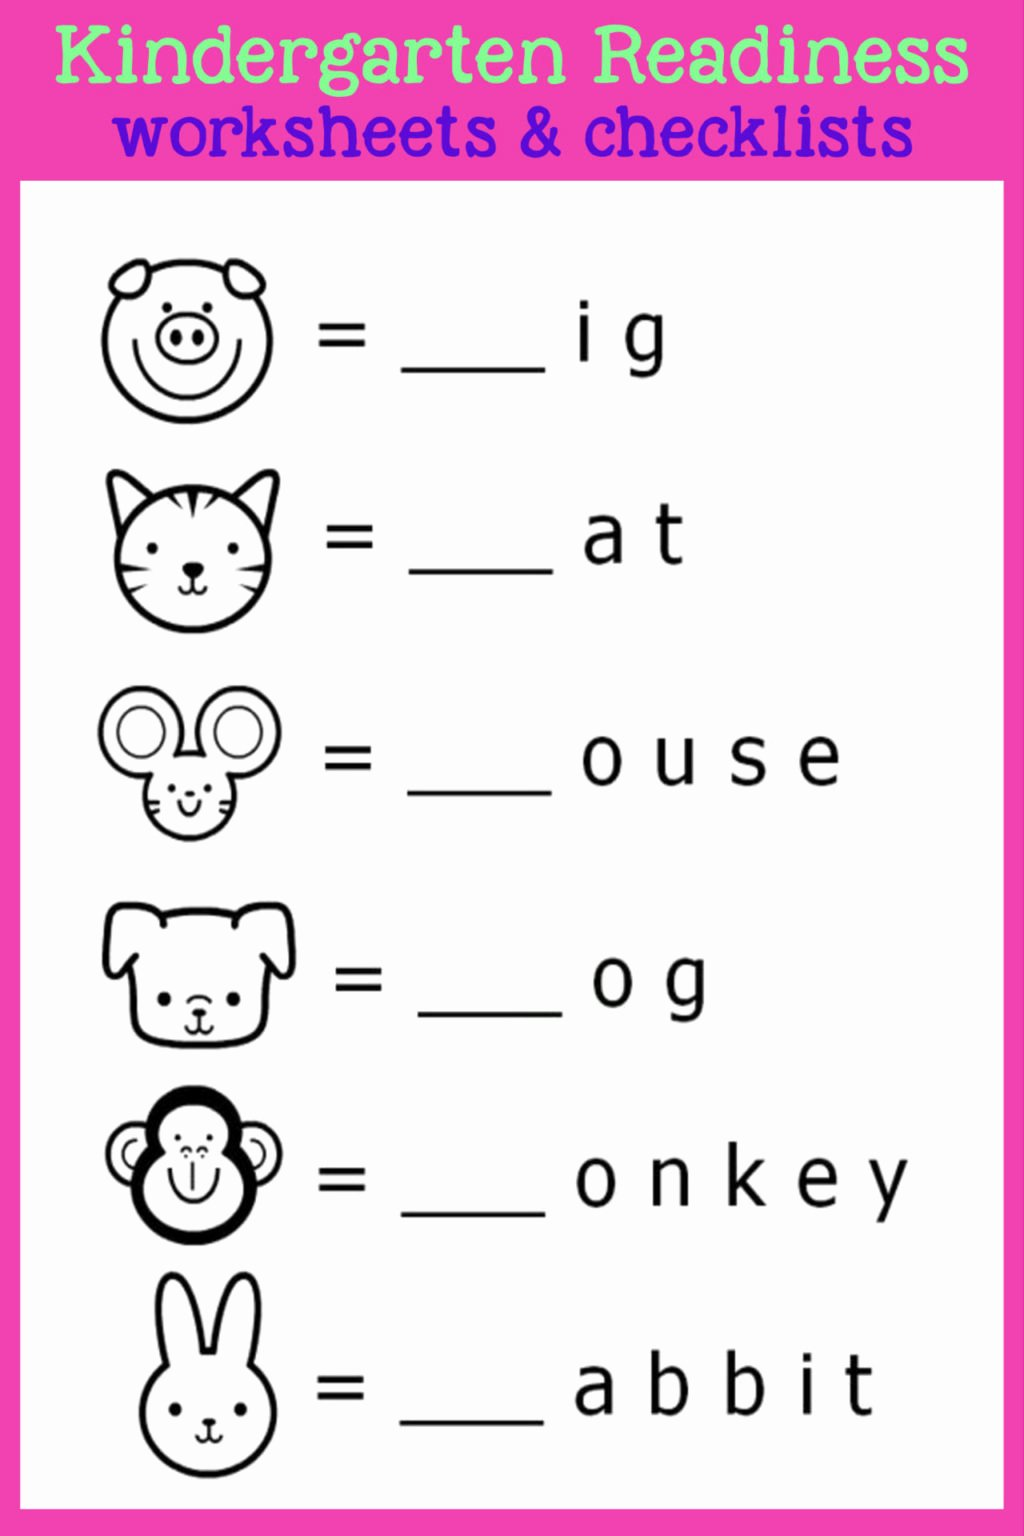 Readiness Worksheets for Preschoolers top Worksheet Kindergarten Readiness Checklists Free Printable